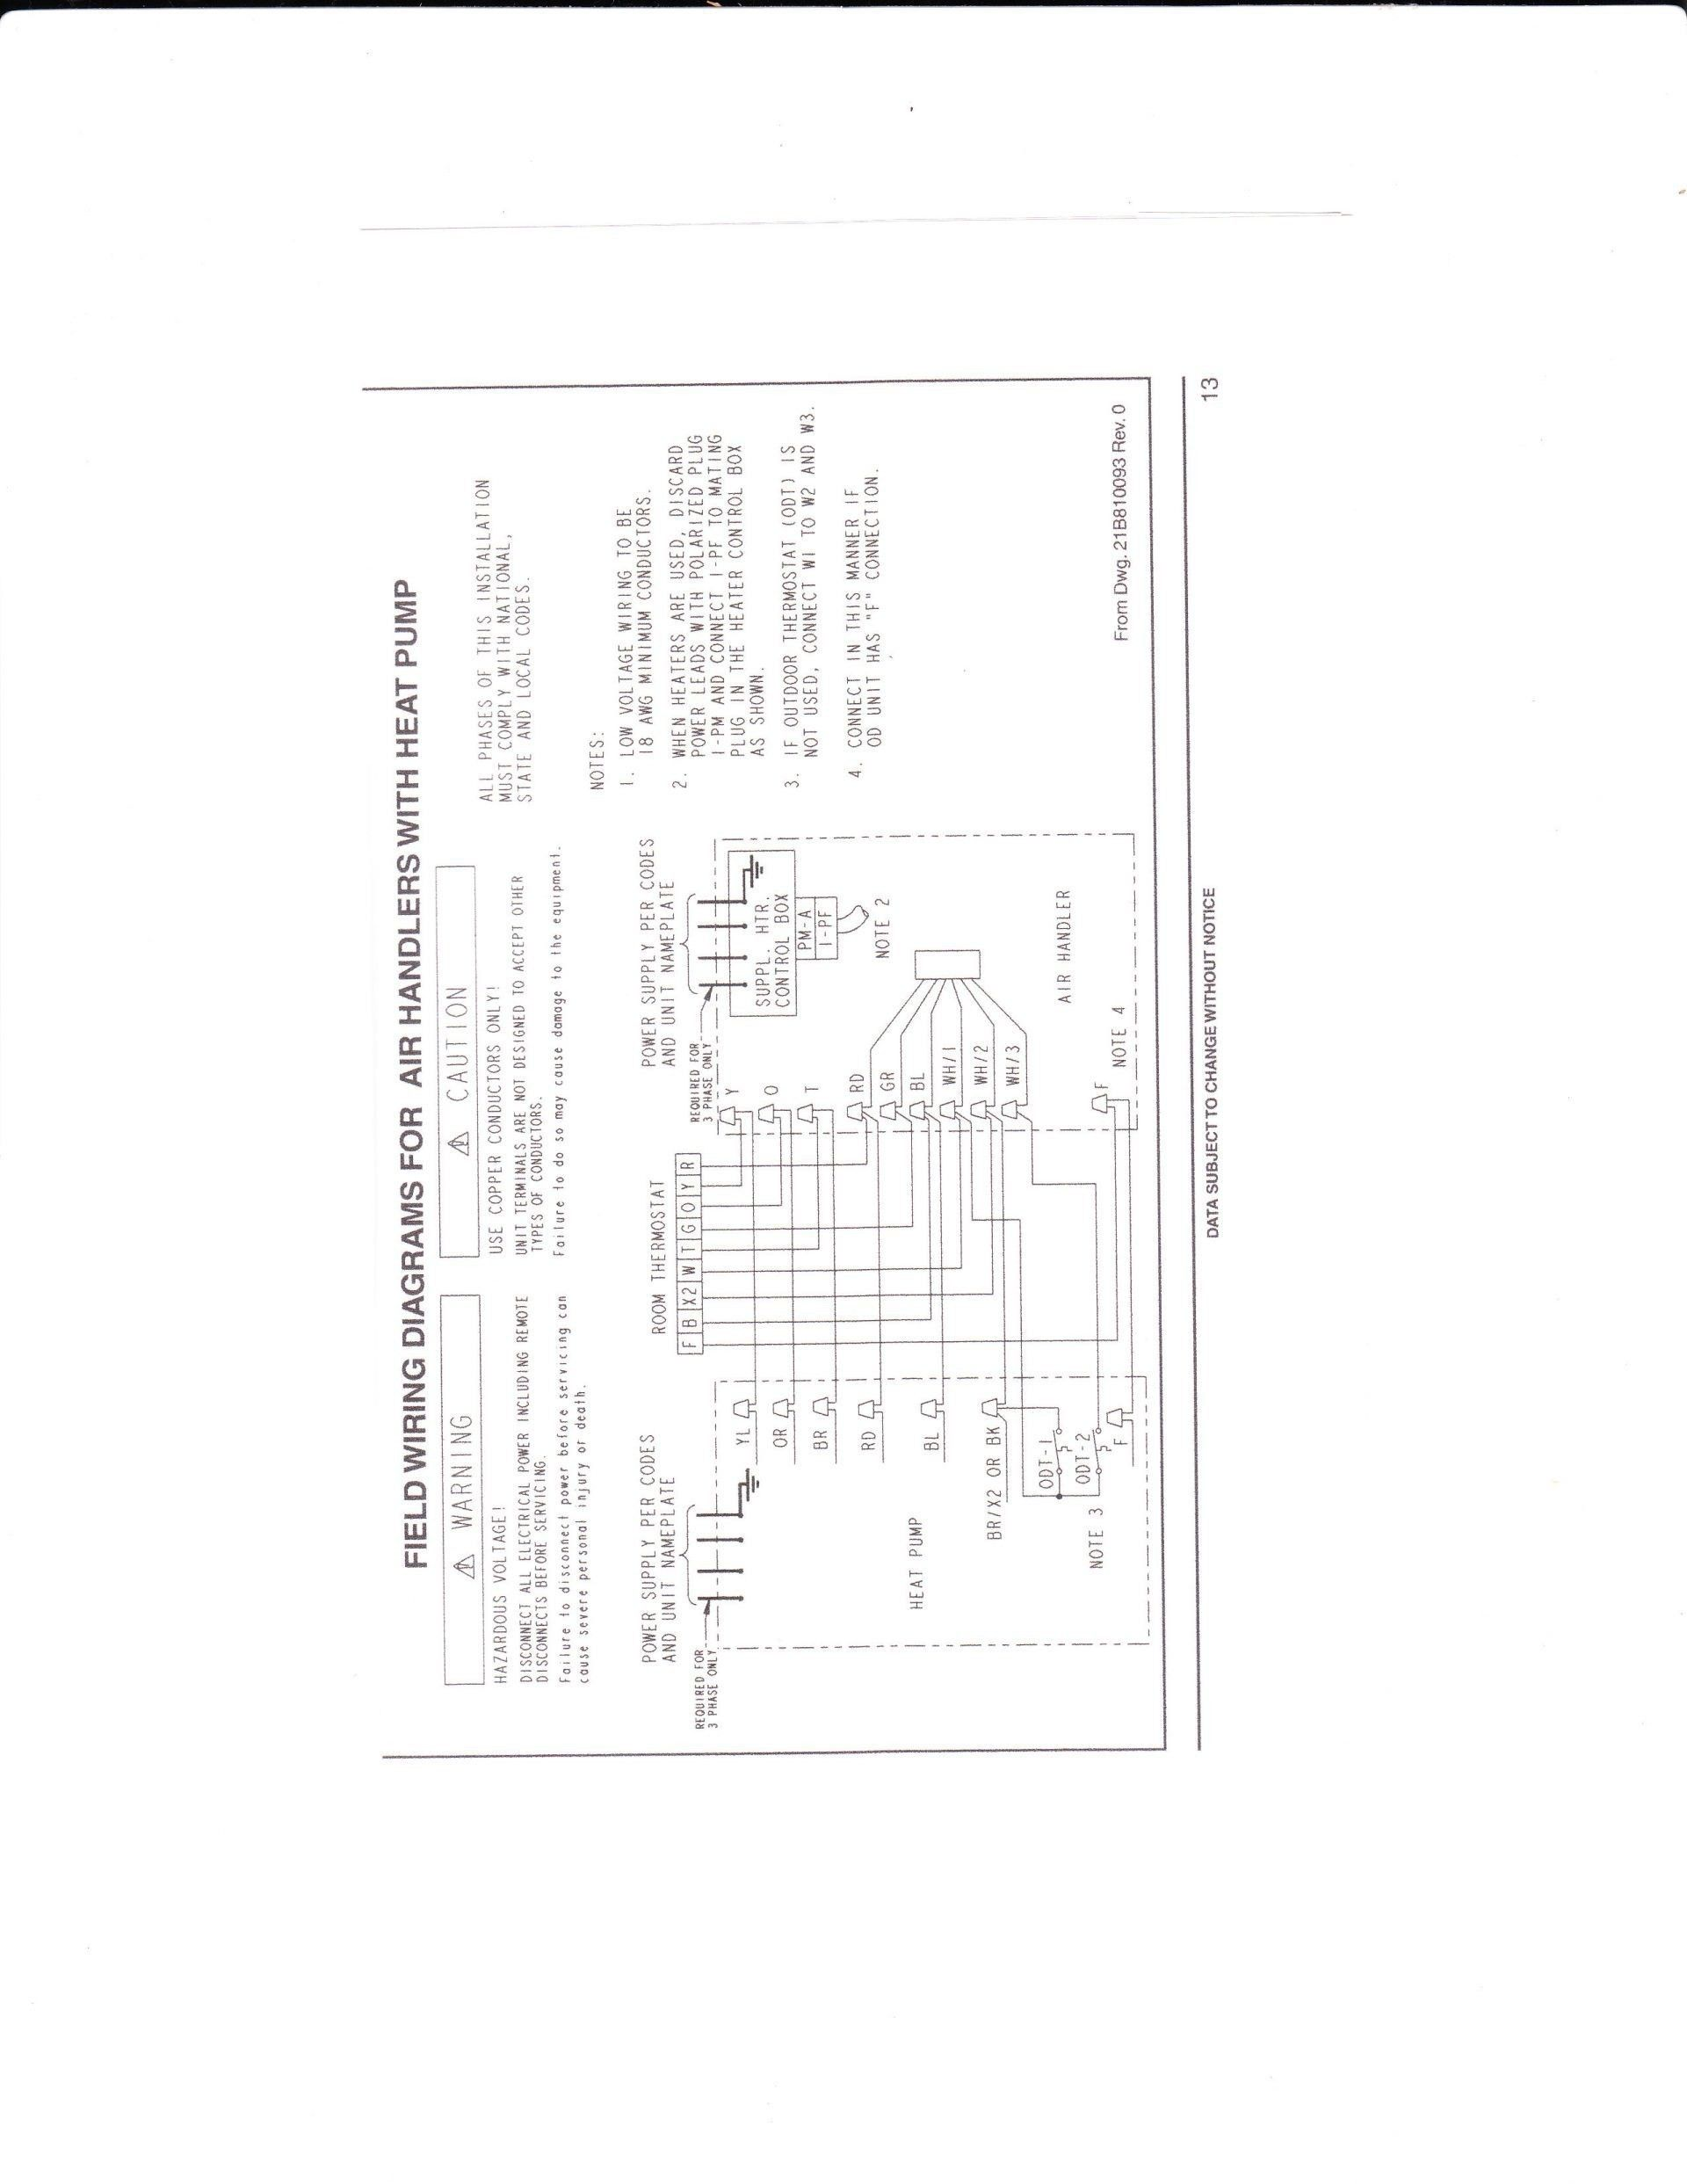 Hoa Wiring Diagram from i.pinimg.com